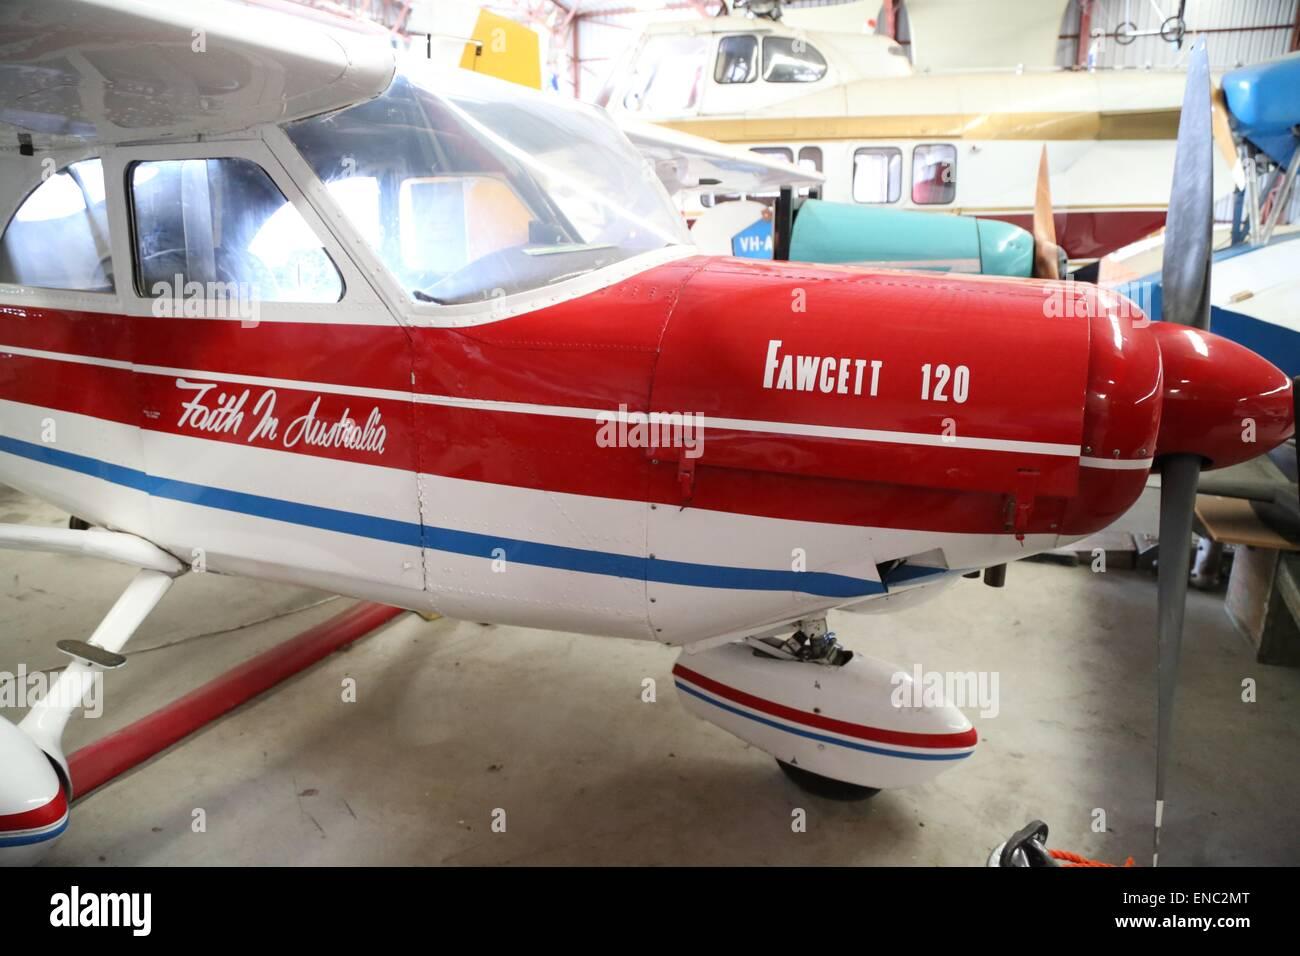 A Fawcett 120 monoplane at the Australian Aviation Museum Bankstown. - Stock Image